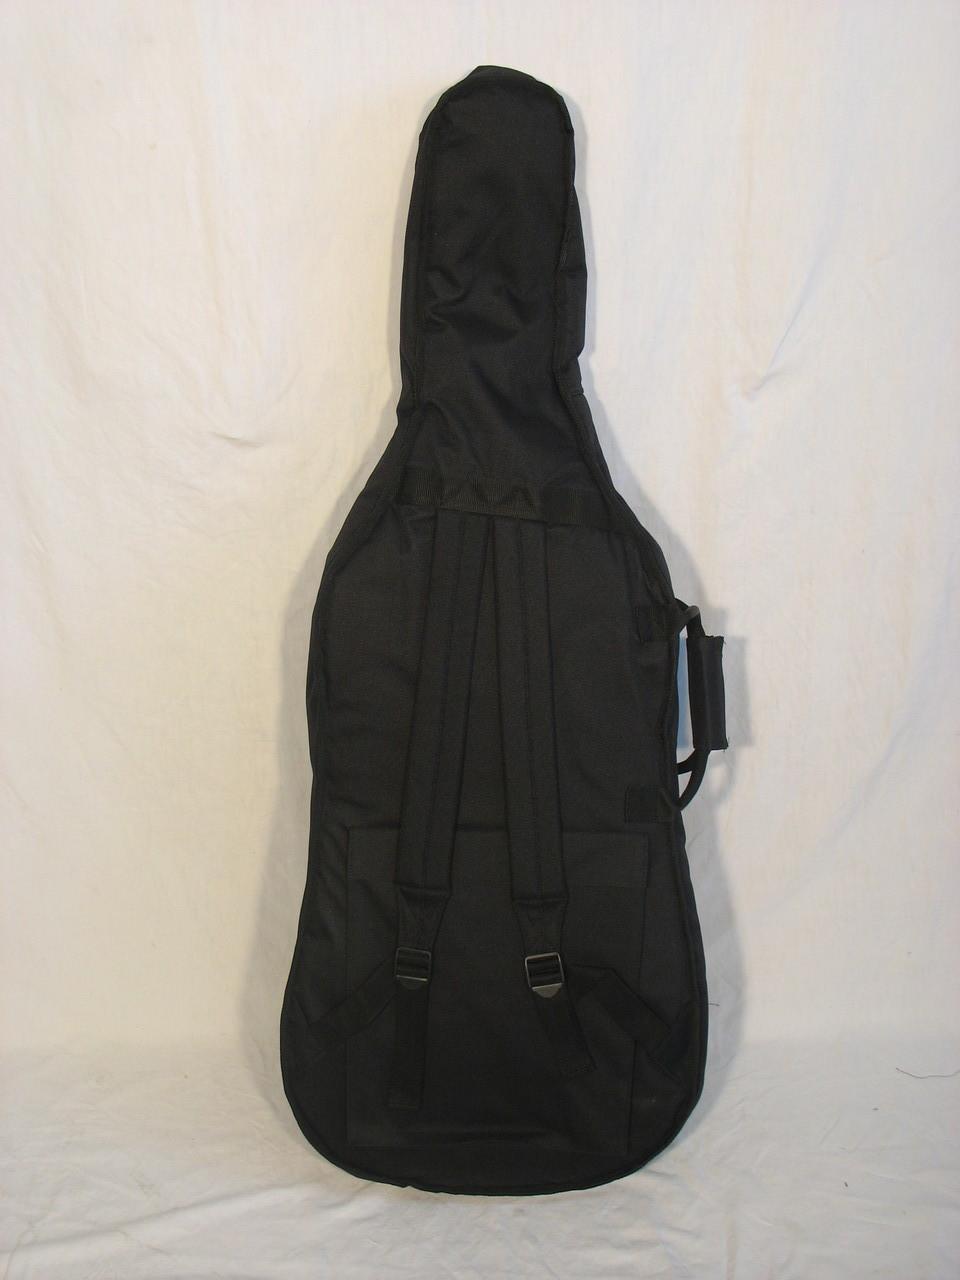 Housse violoncelle 3 4 noire france europe lutherie for Housse violoncelle